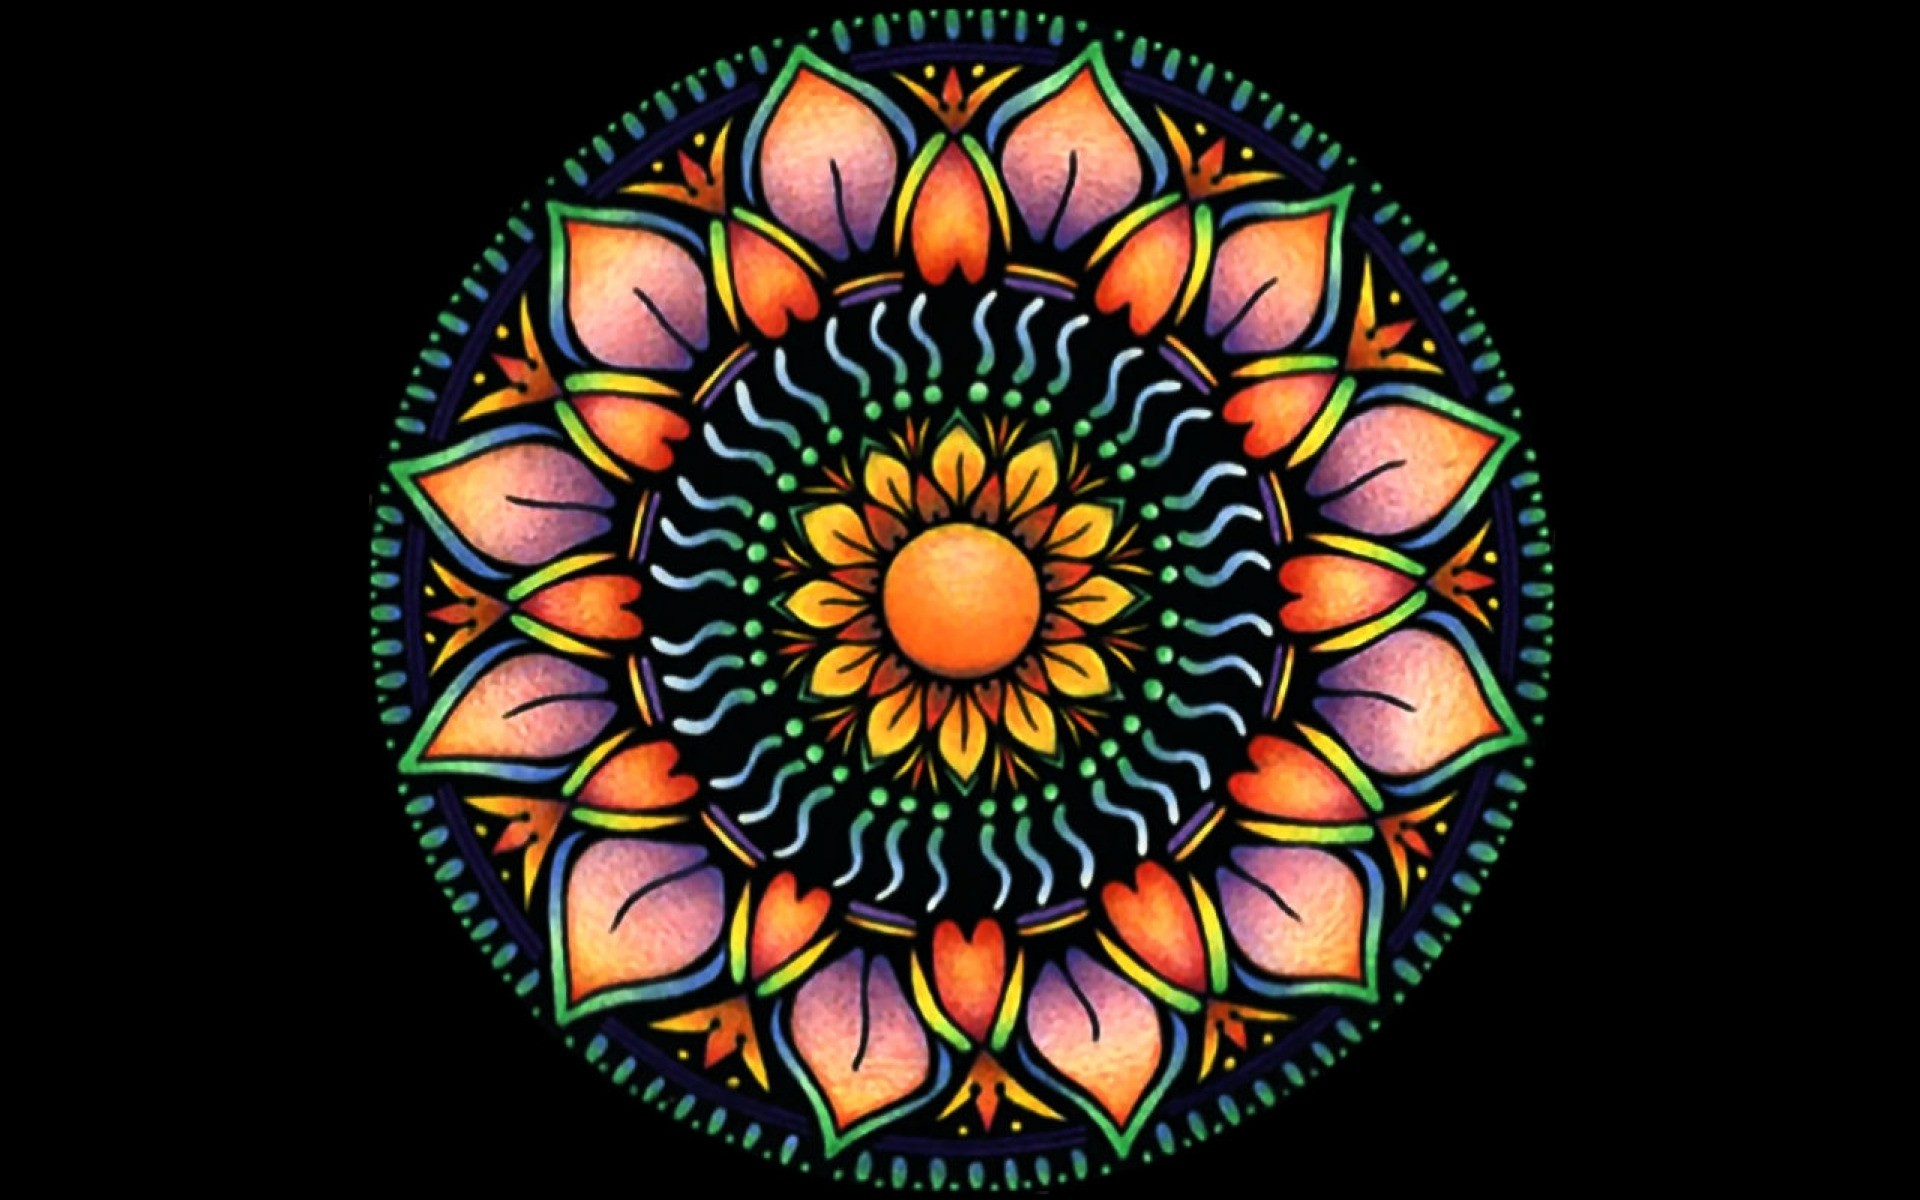 Cool Mandala Para Colorear Cool Mandalas Para Colorear De: Mandala Wallpaper Desktop (61+ Images